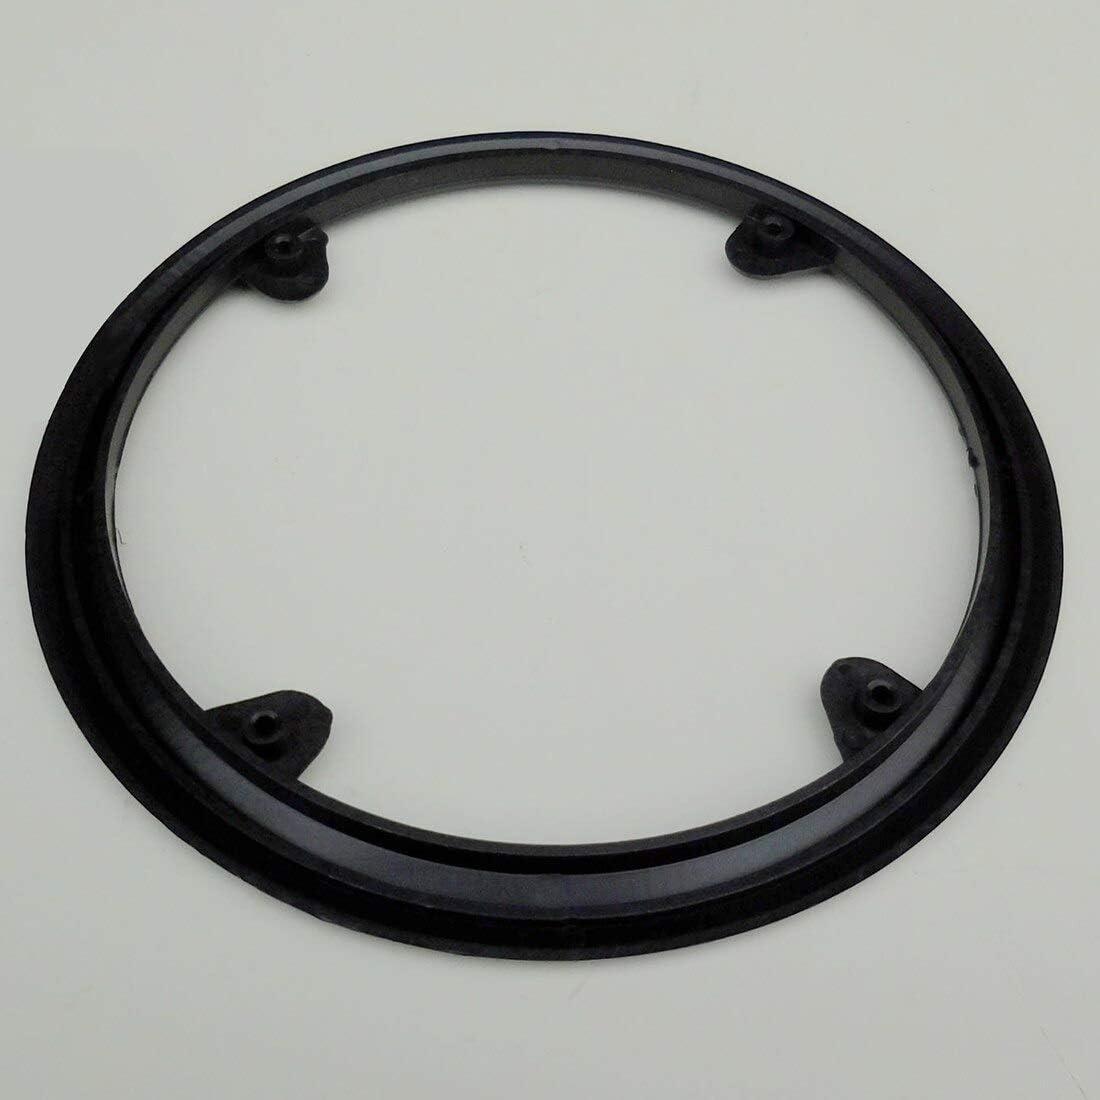 MTB Bicycle Crankset Cap Plastic Chain Wheel Cover 4 Holes Protective Guard New